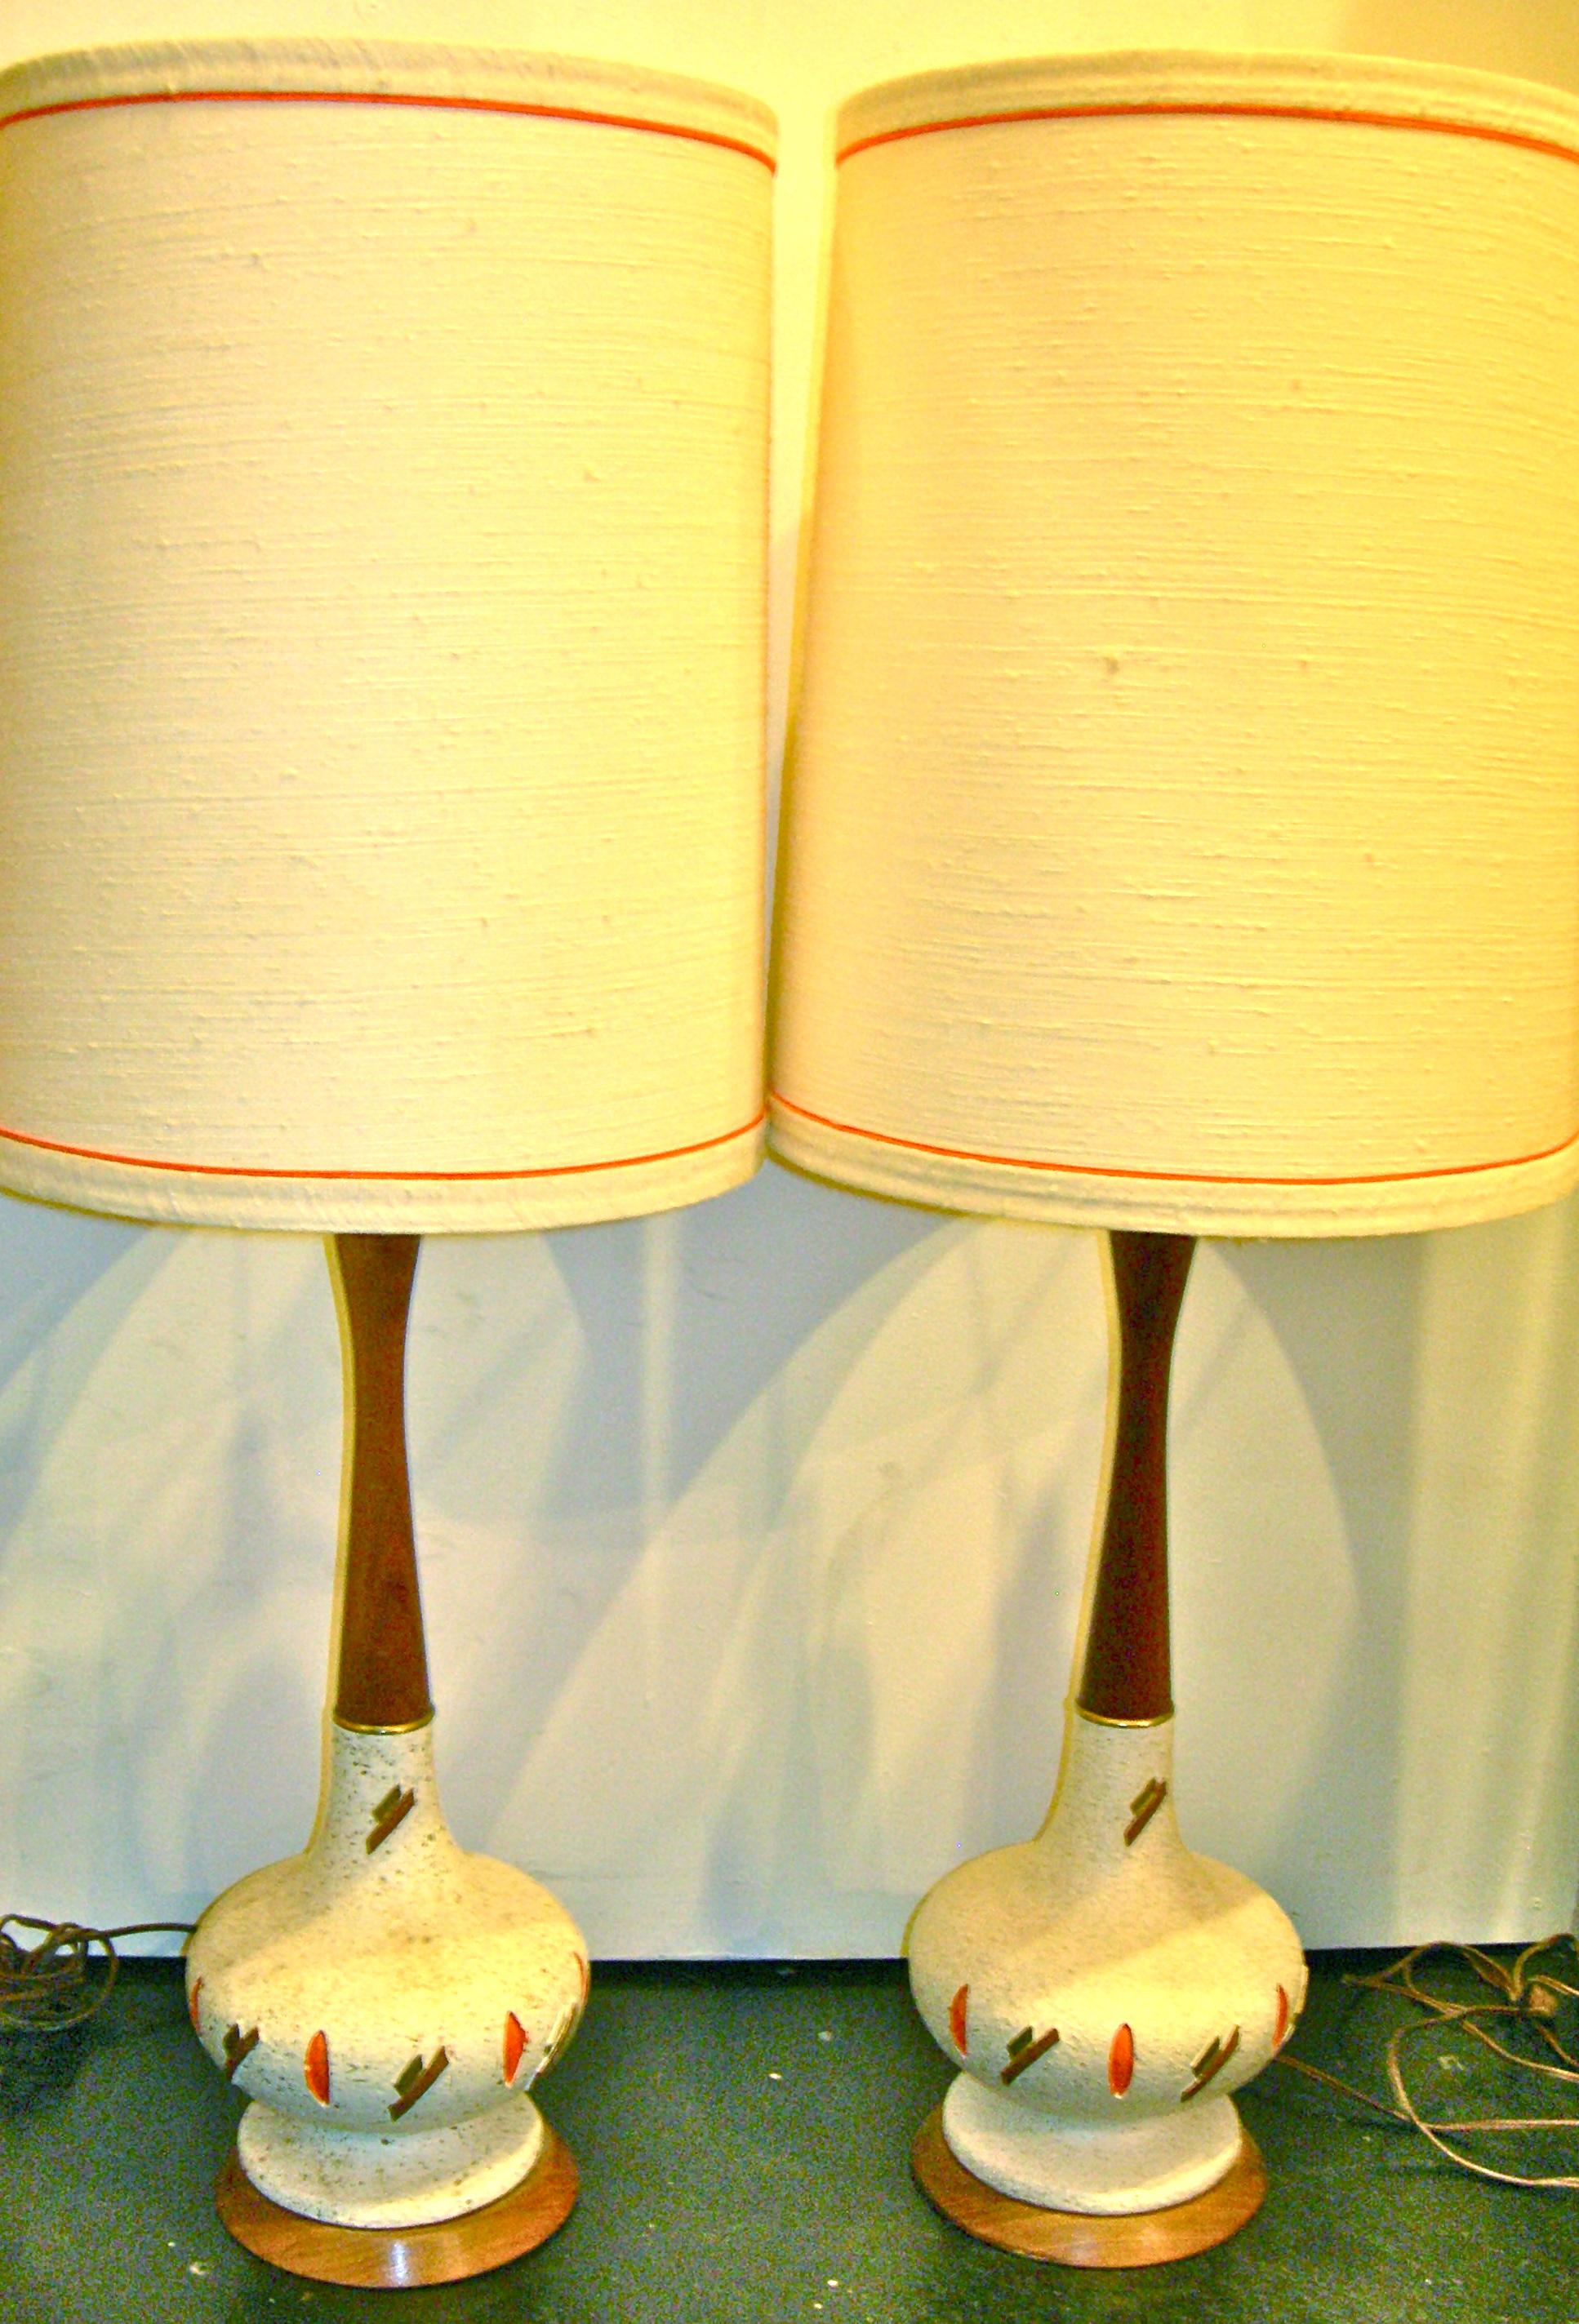 Pair of vintage ceramic base lamps with orange & brown shapes